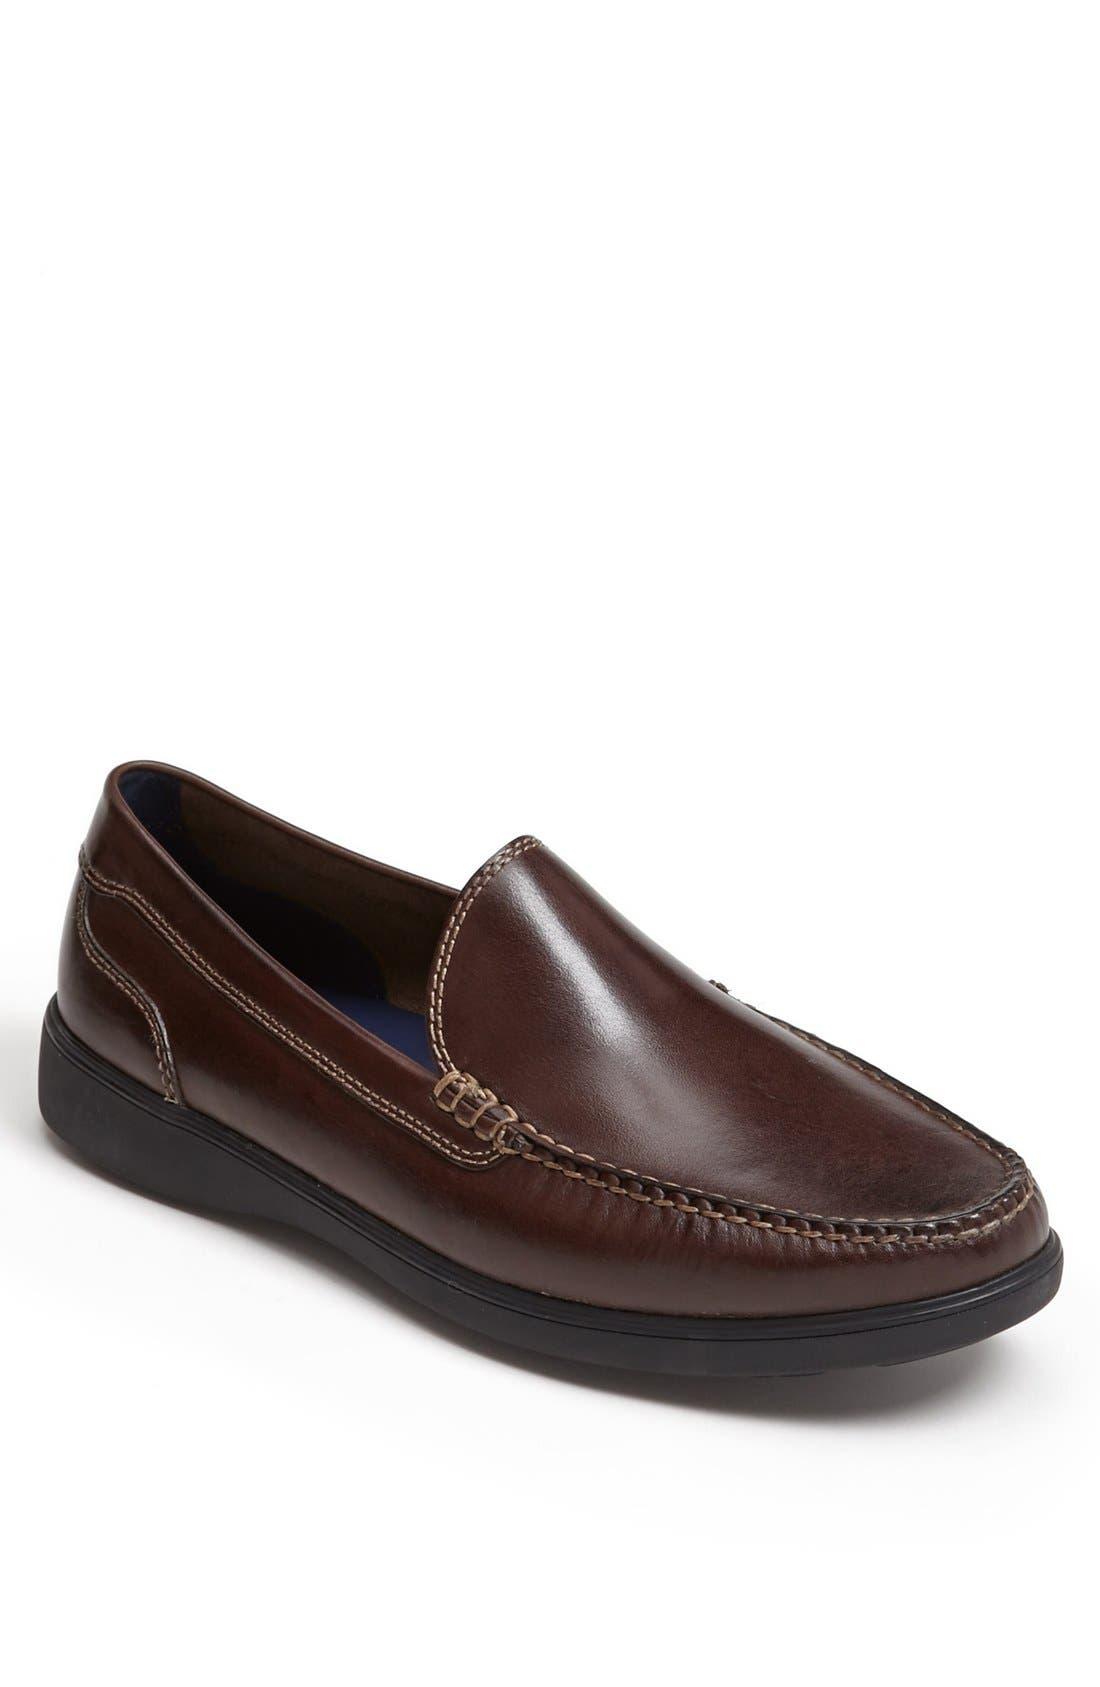 Alternate Image 1 Selected - Cole Haan 'Sutton' Venetian Loafer   (Men)